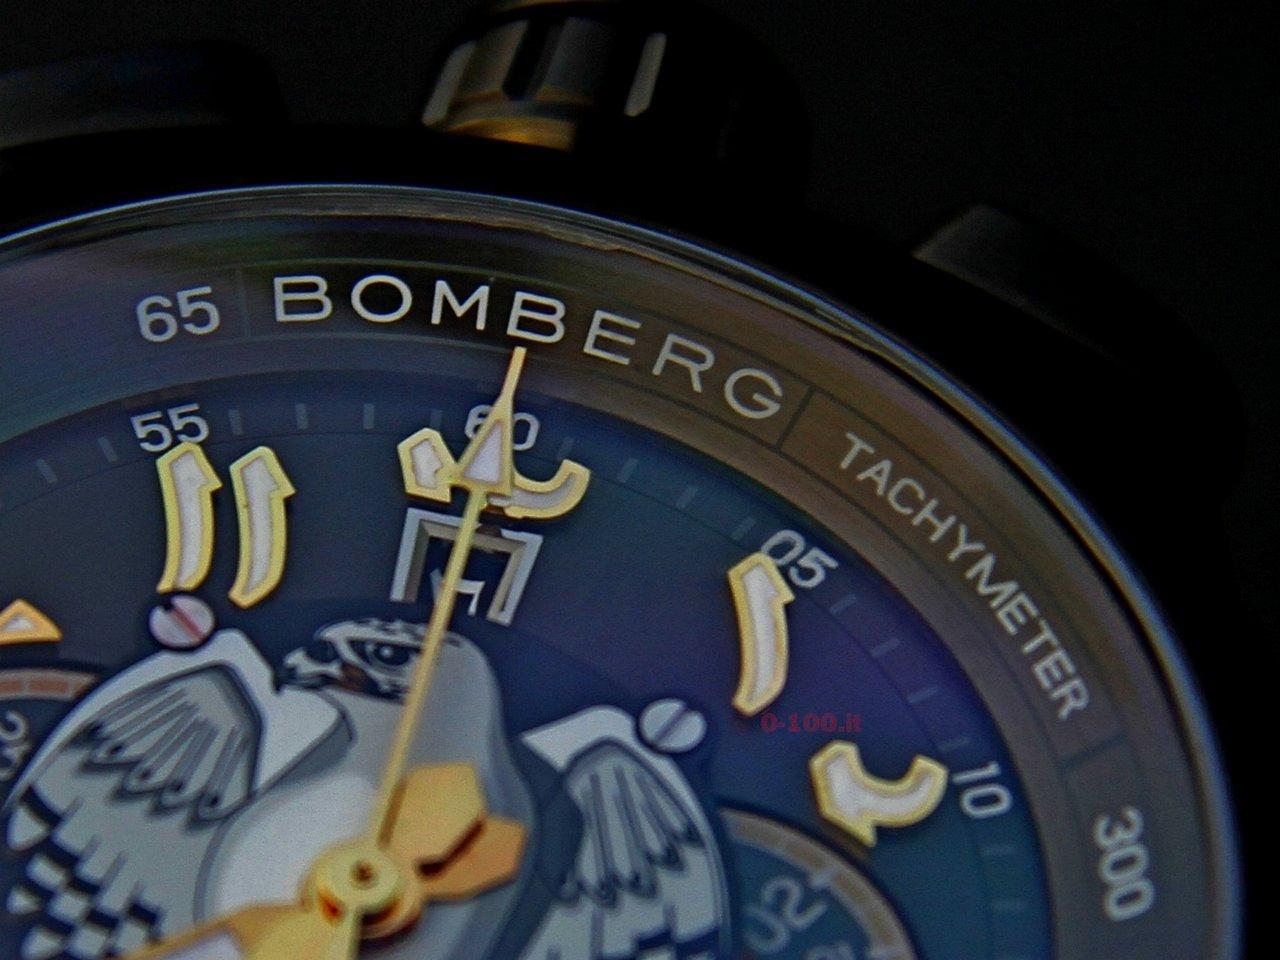 baselworld-2015_bomberg-bolt-68-falcon-chronograph_0-100-4